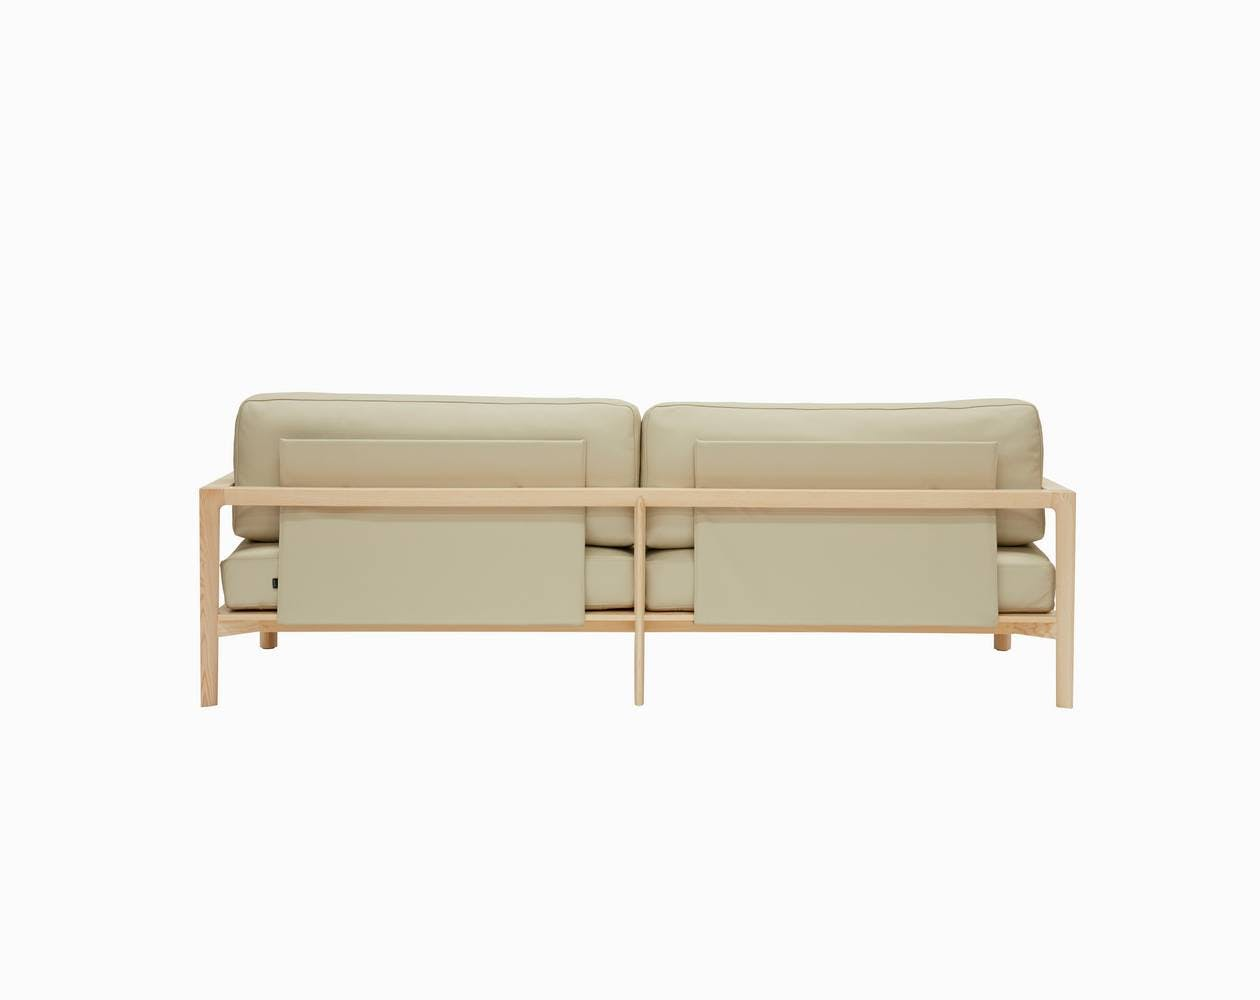 Astounding Ling Sofa Sp01 Design Gamerscity Chair Design For Home Gamerscityorg